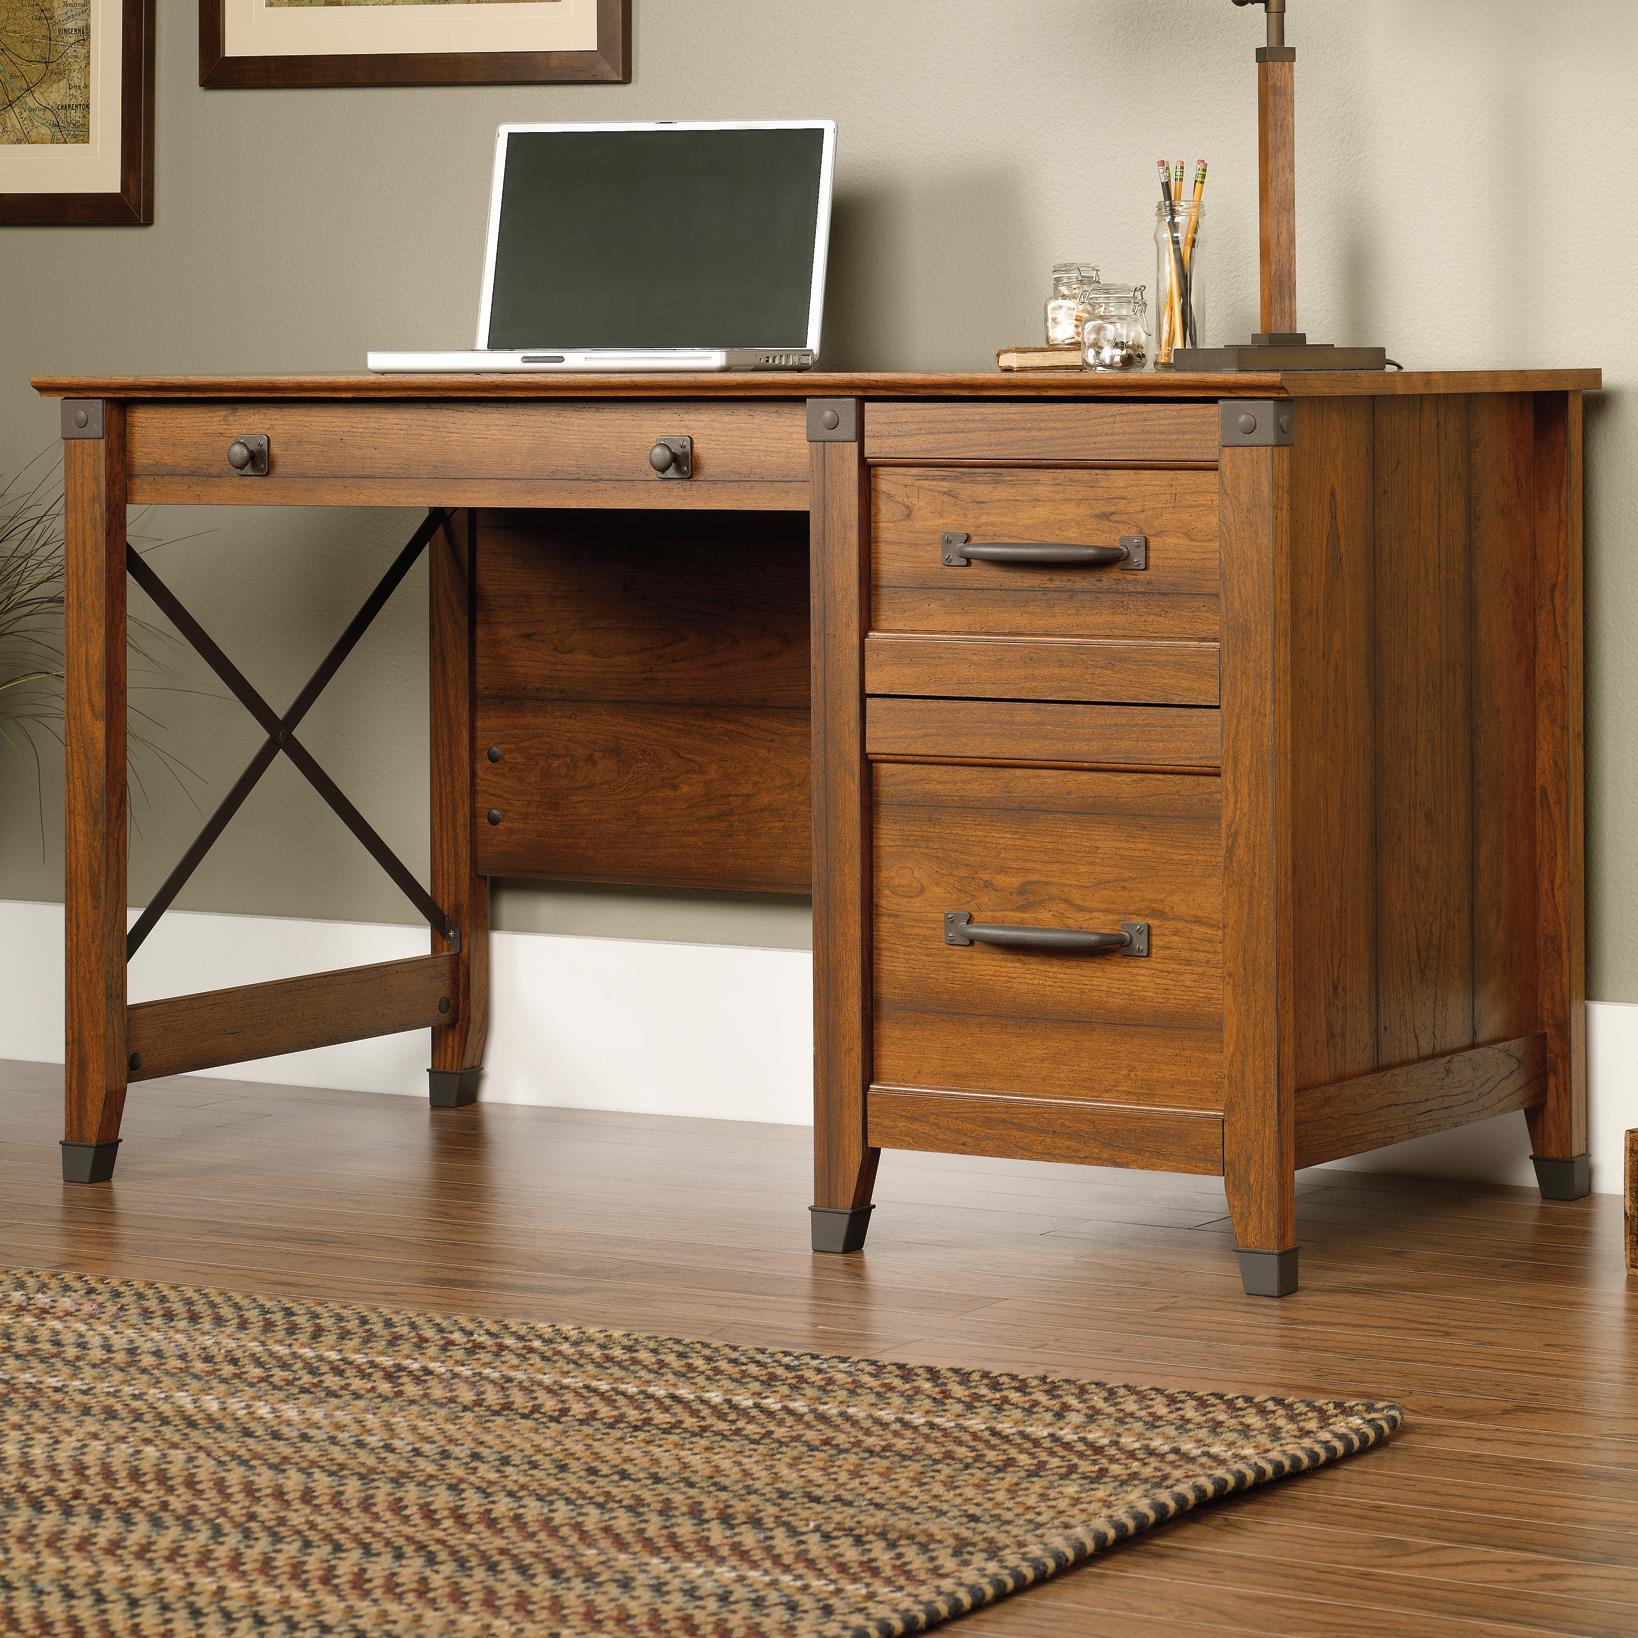 Sauder Carson Forge Single Pedestal Desk With Industrial